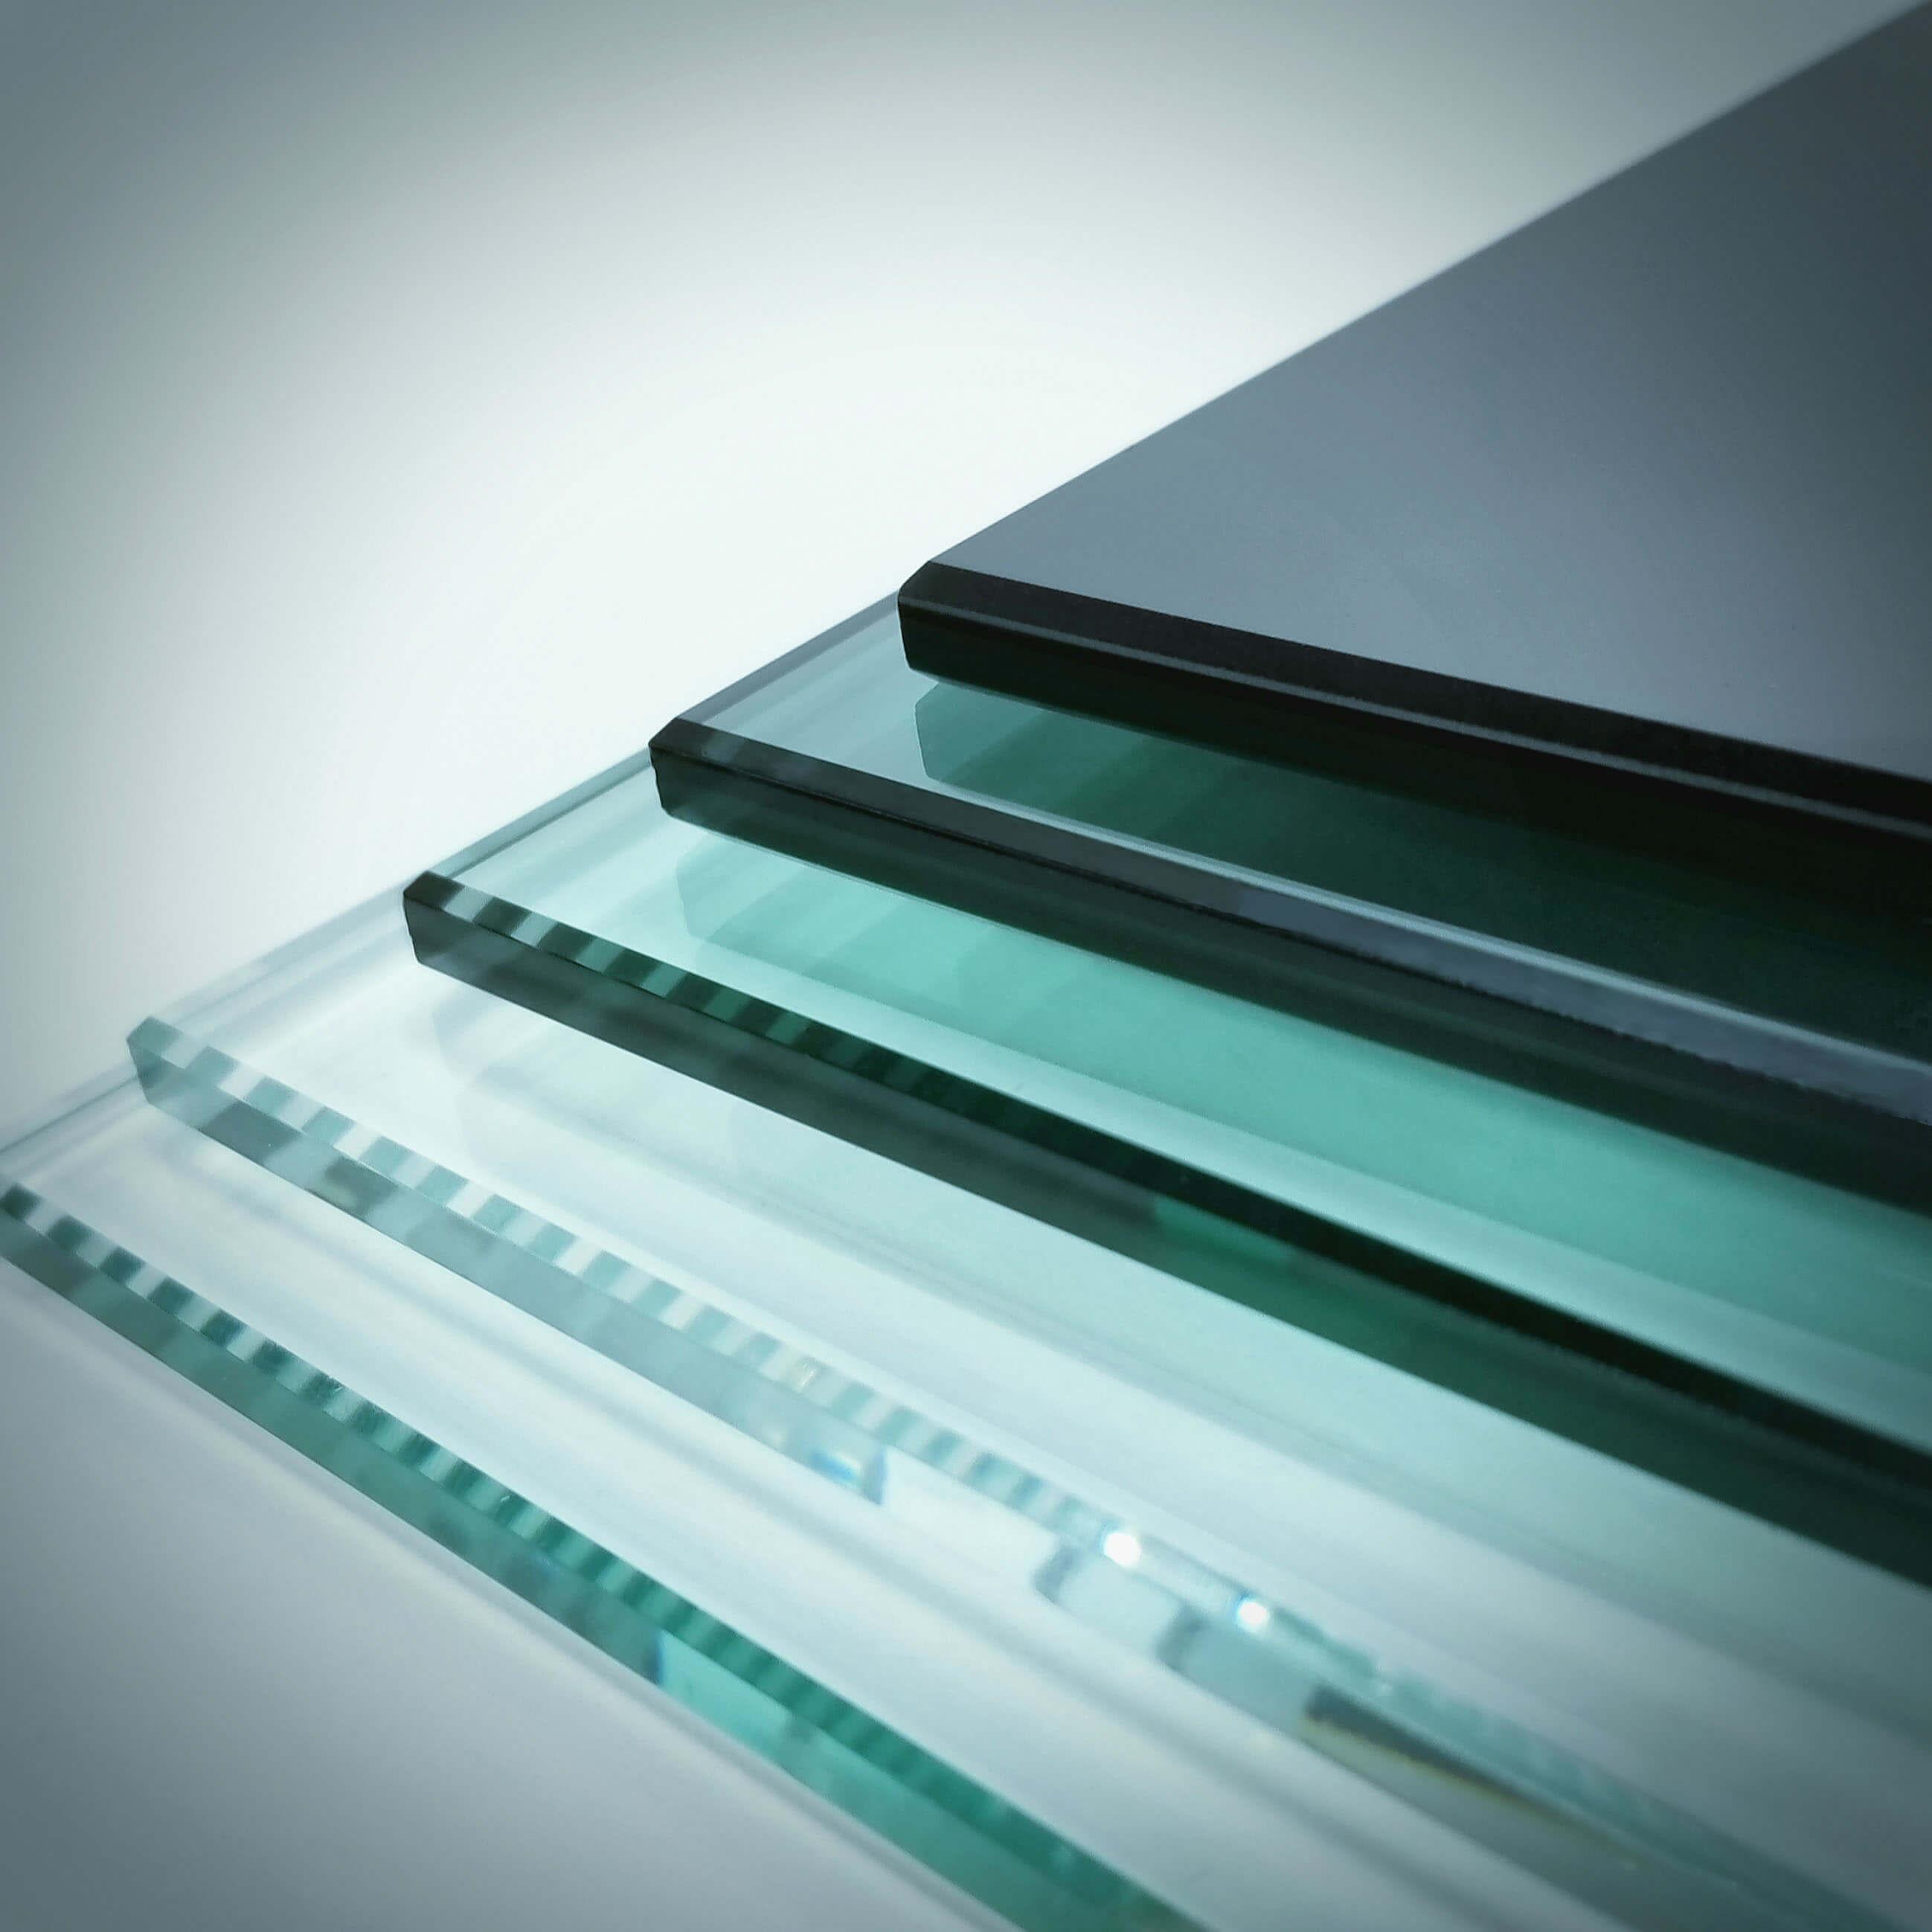 Staklo u boji Colored Glass Farbiges Glas